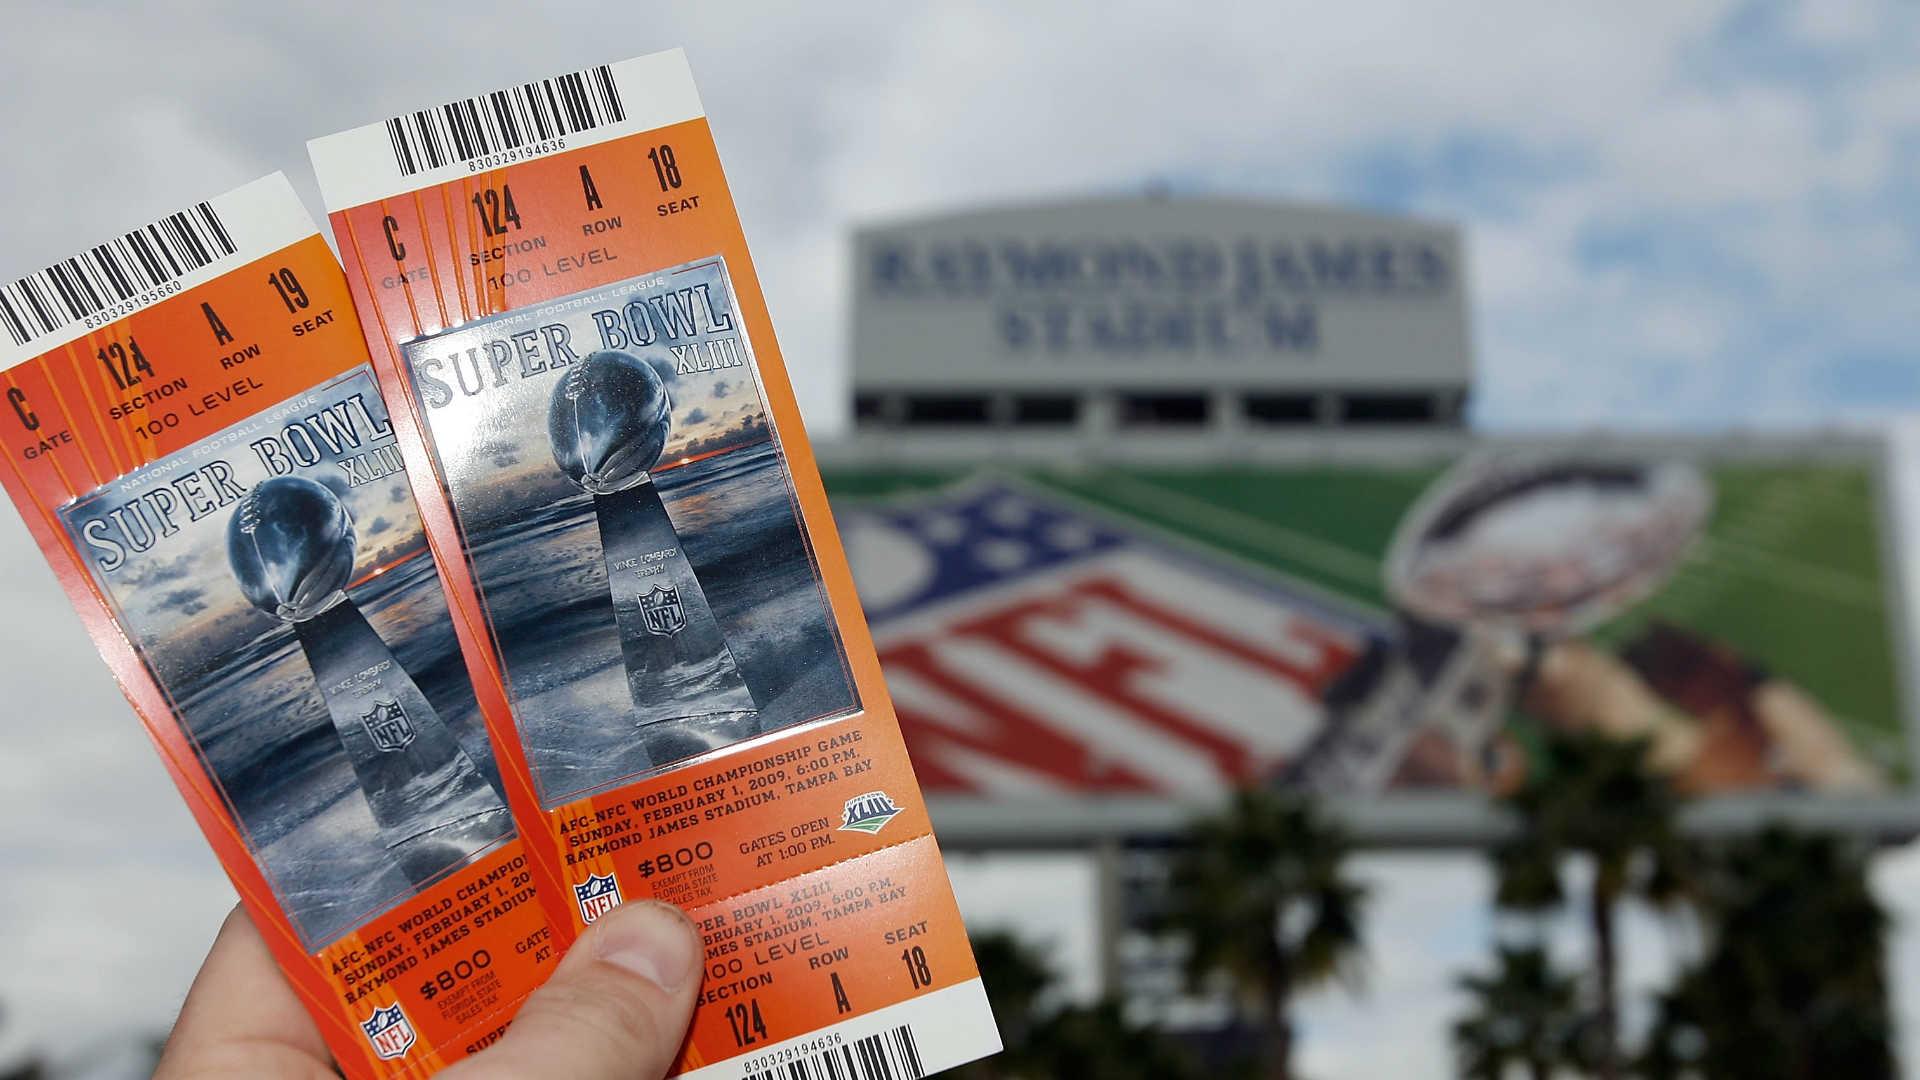 Super-Bowl-tickets-020216-Getty-FTR.jpg